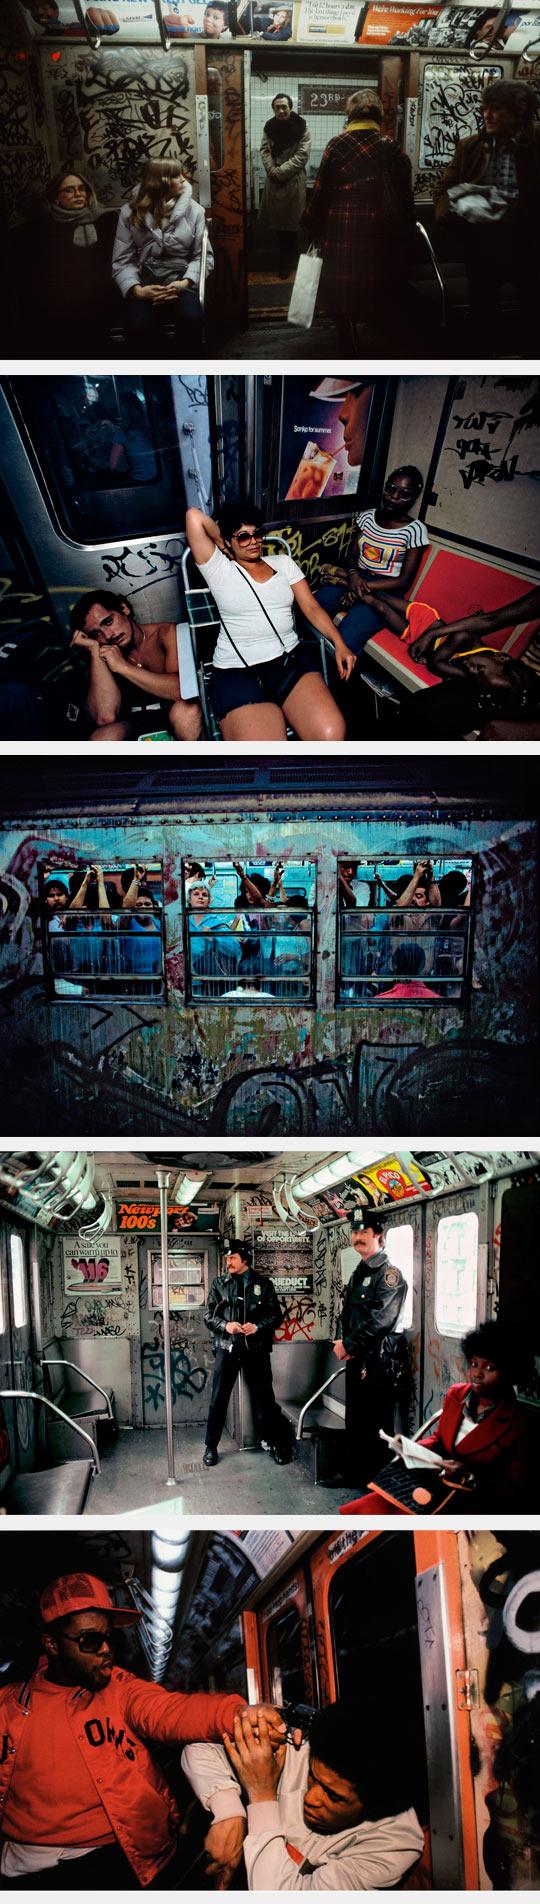 funny-subway-New-York-80-decade